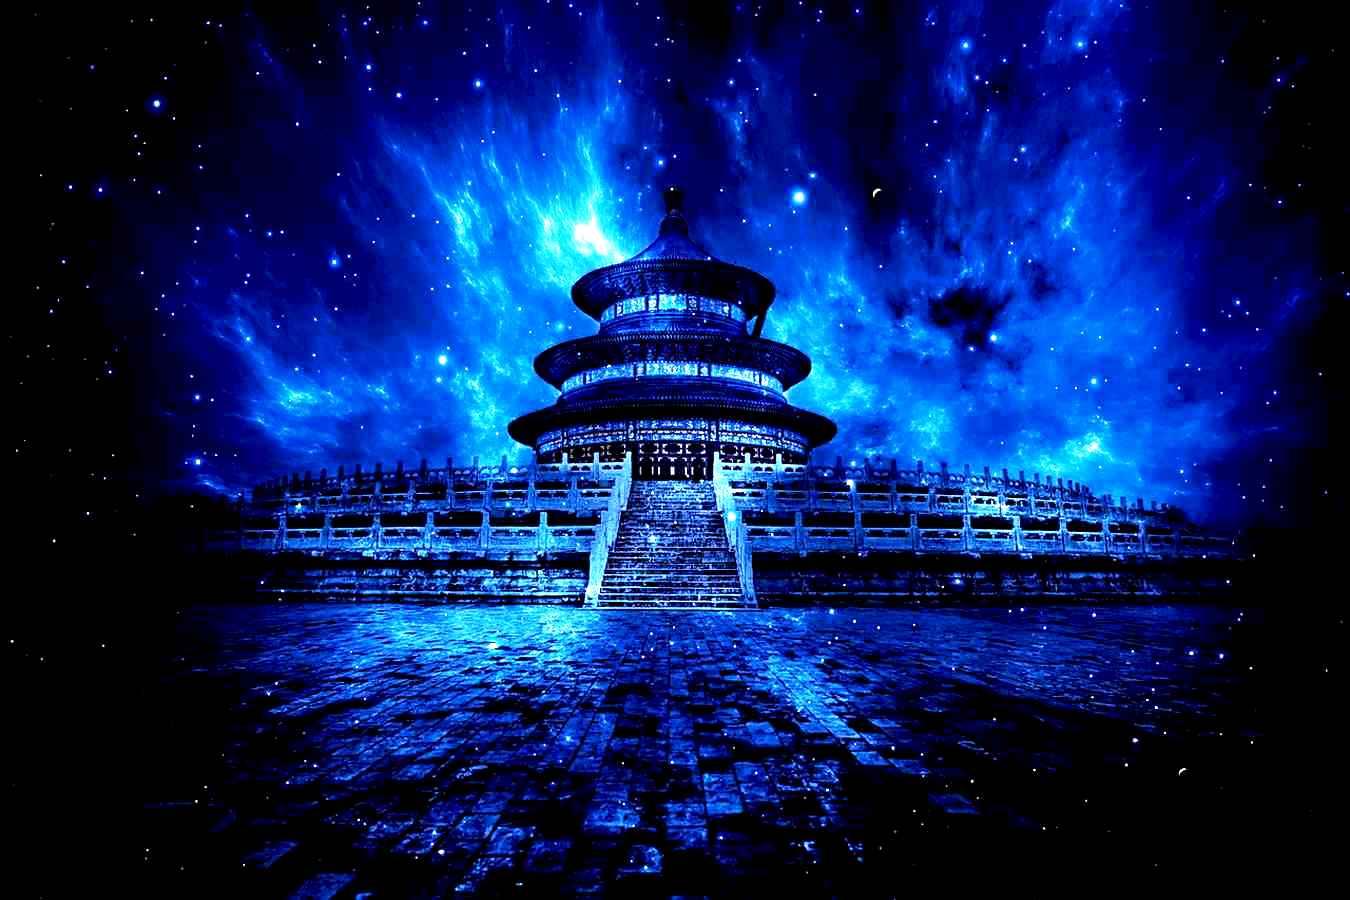 храм неба, фотоколлаж